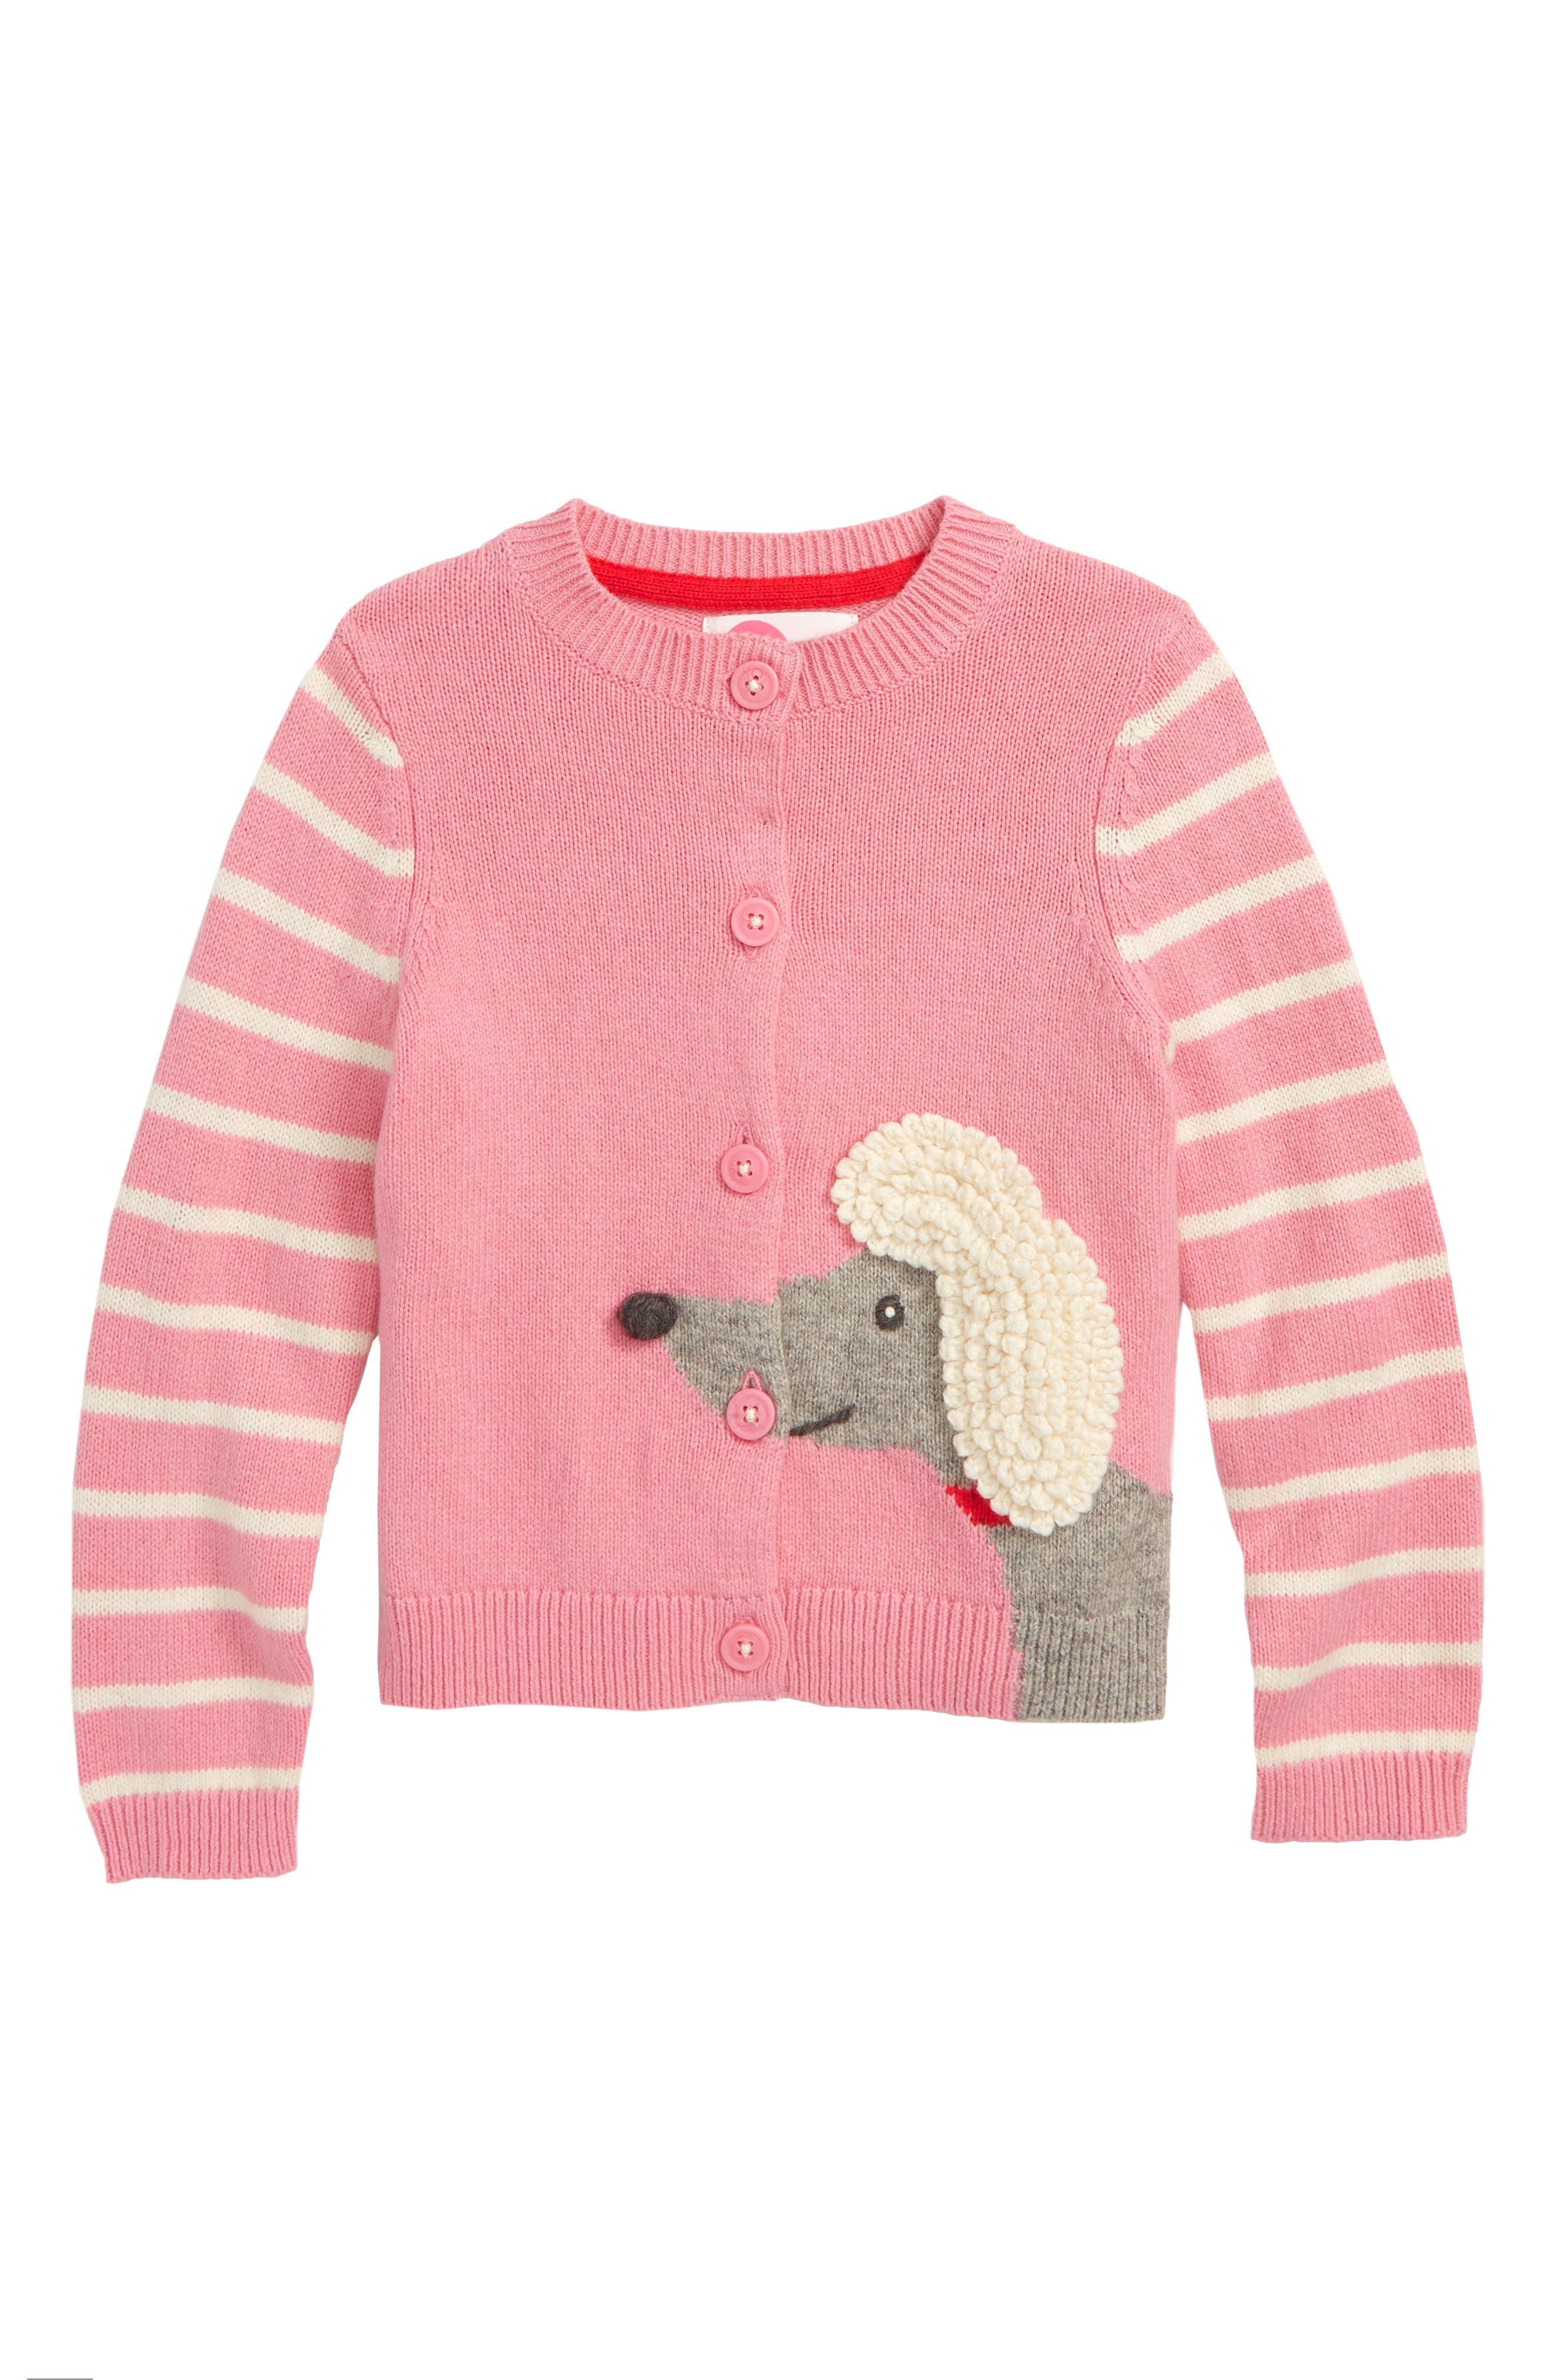 Pet Knit Cardigan,                         Main,                         color, PNK FORMICA PINK POODLE